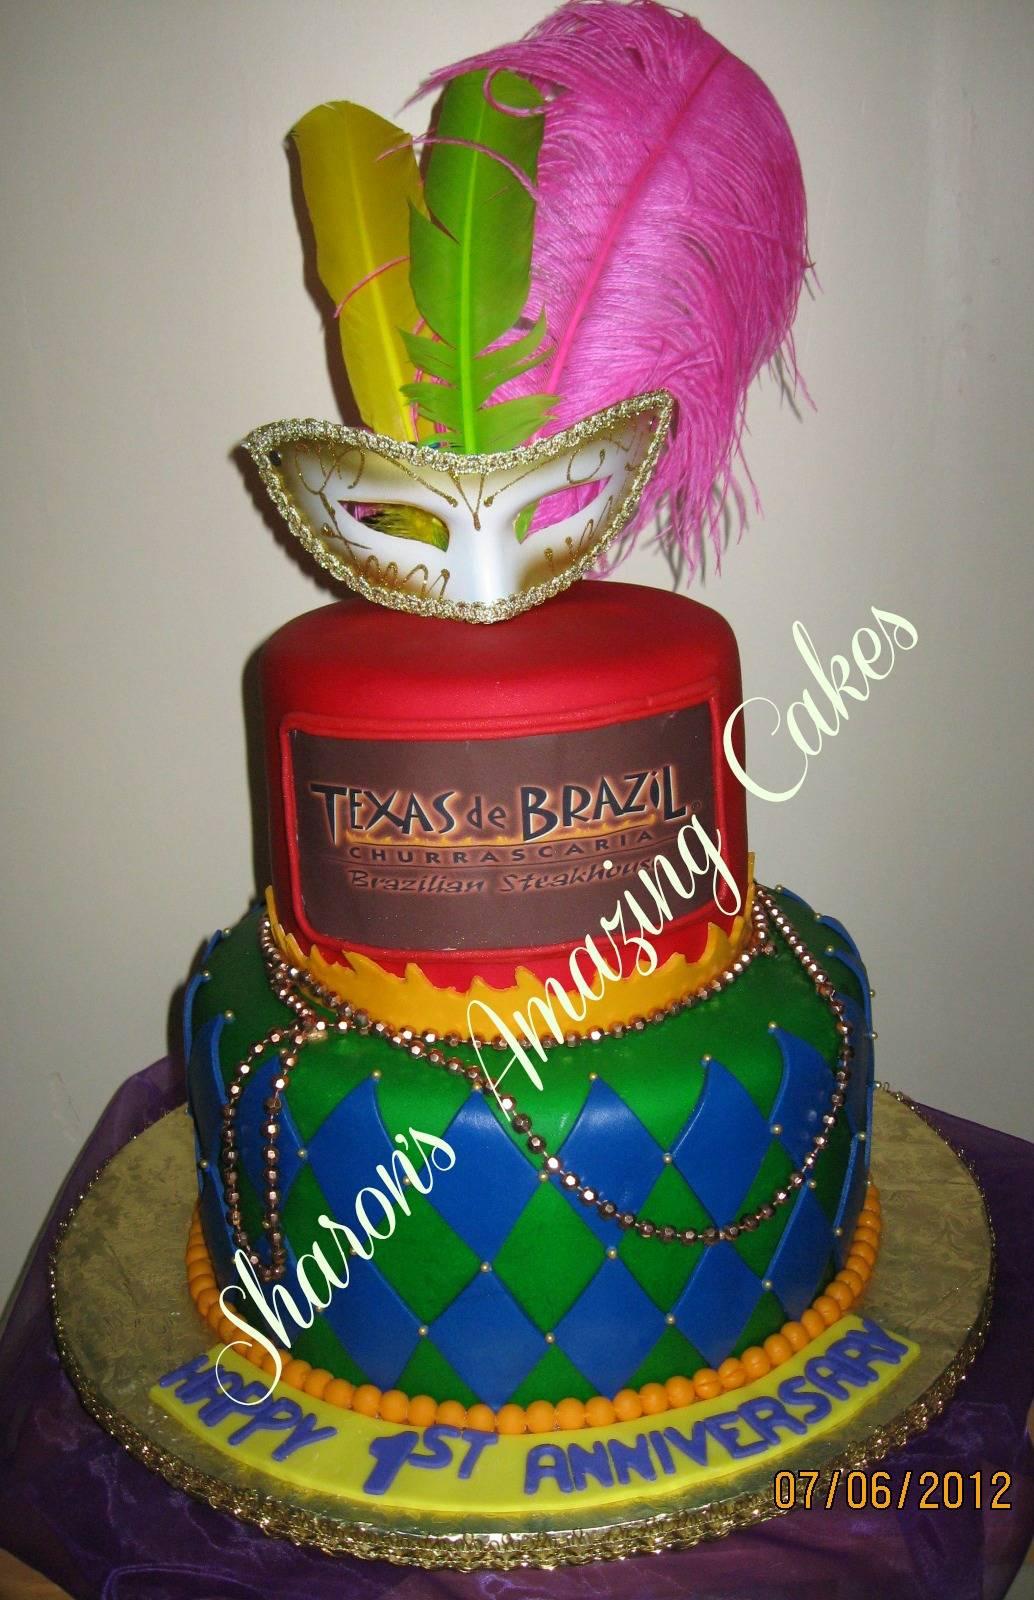 Texas de Brazil 1st Anniversary Cake